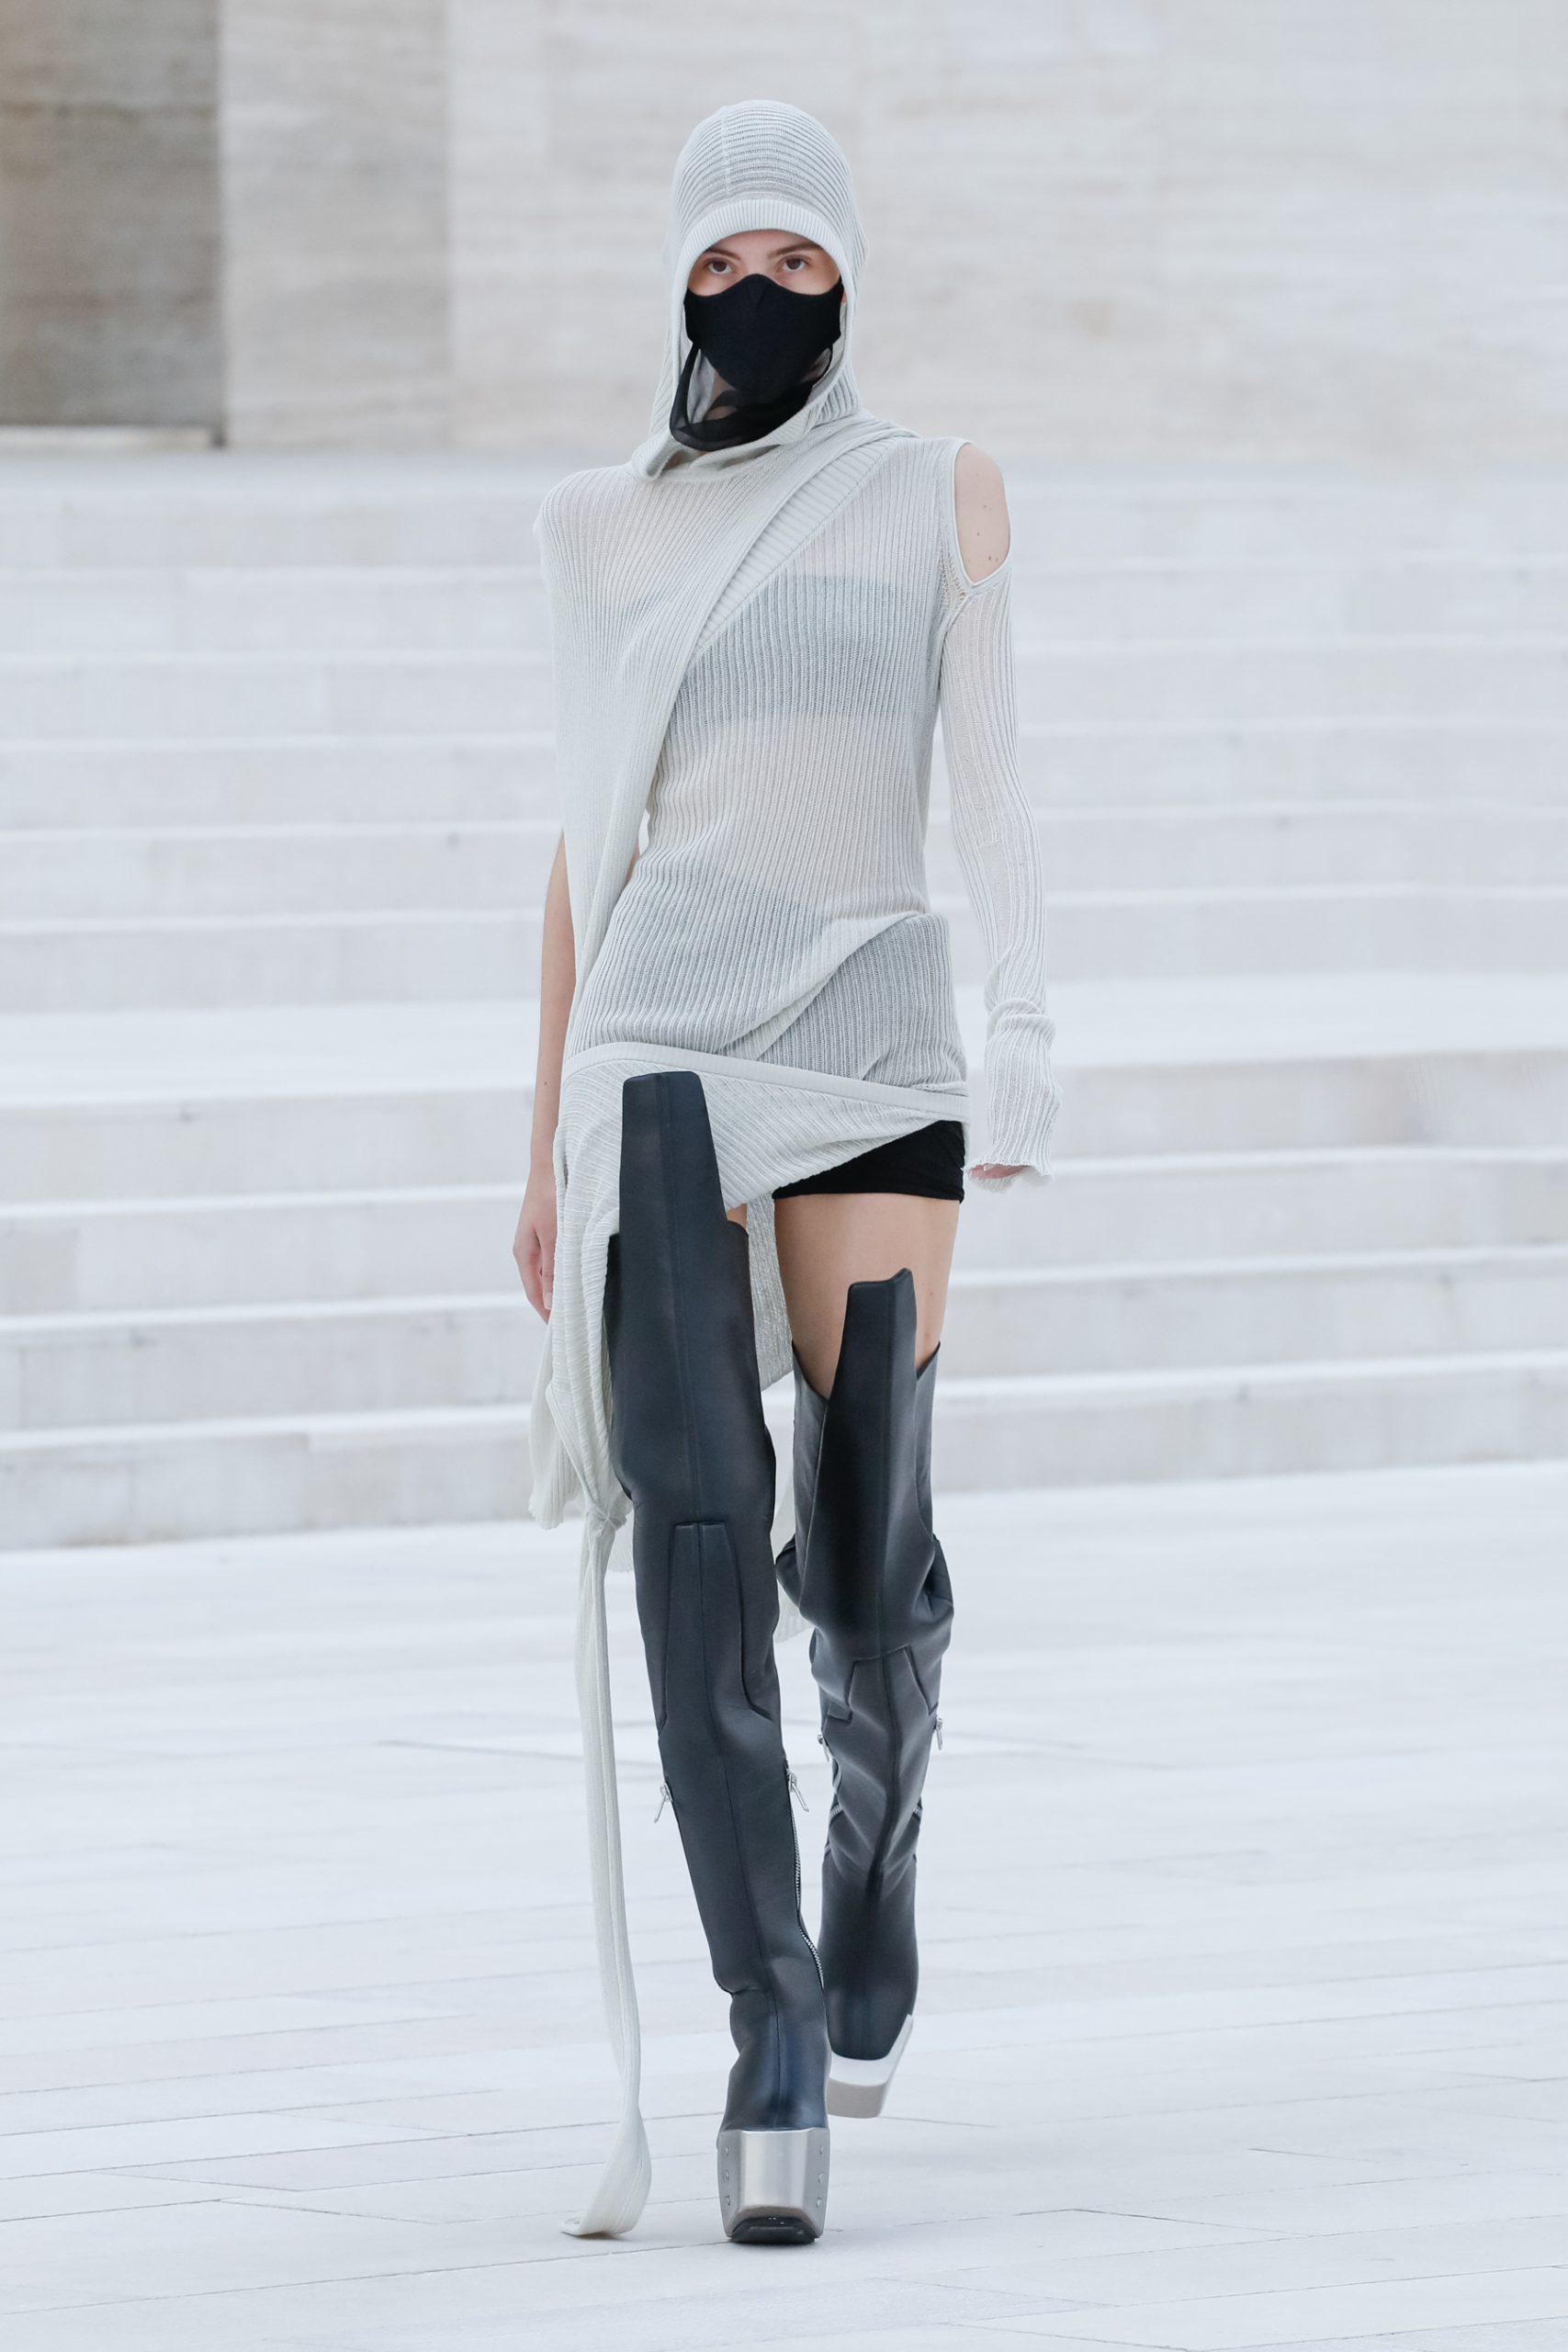 Top 10 Paris Spring 2021 Women's Fashion Shows